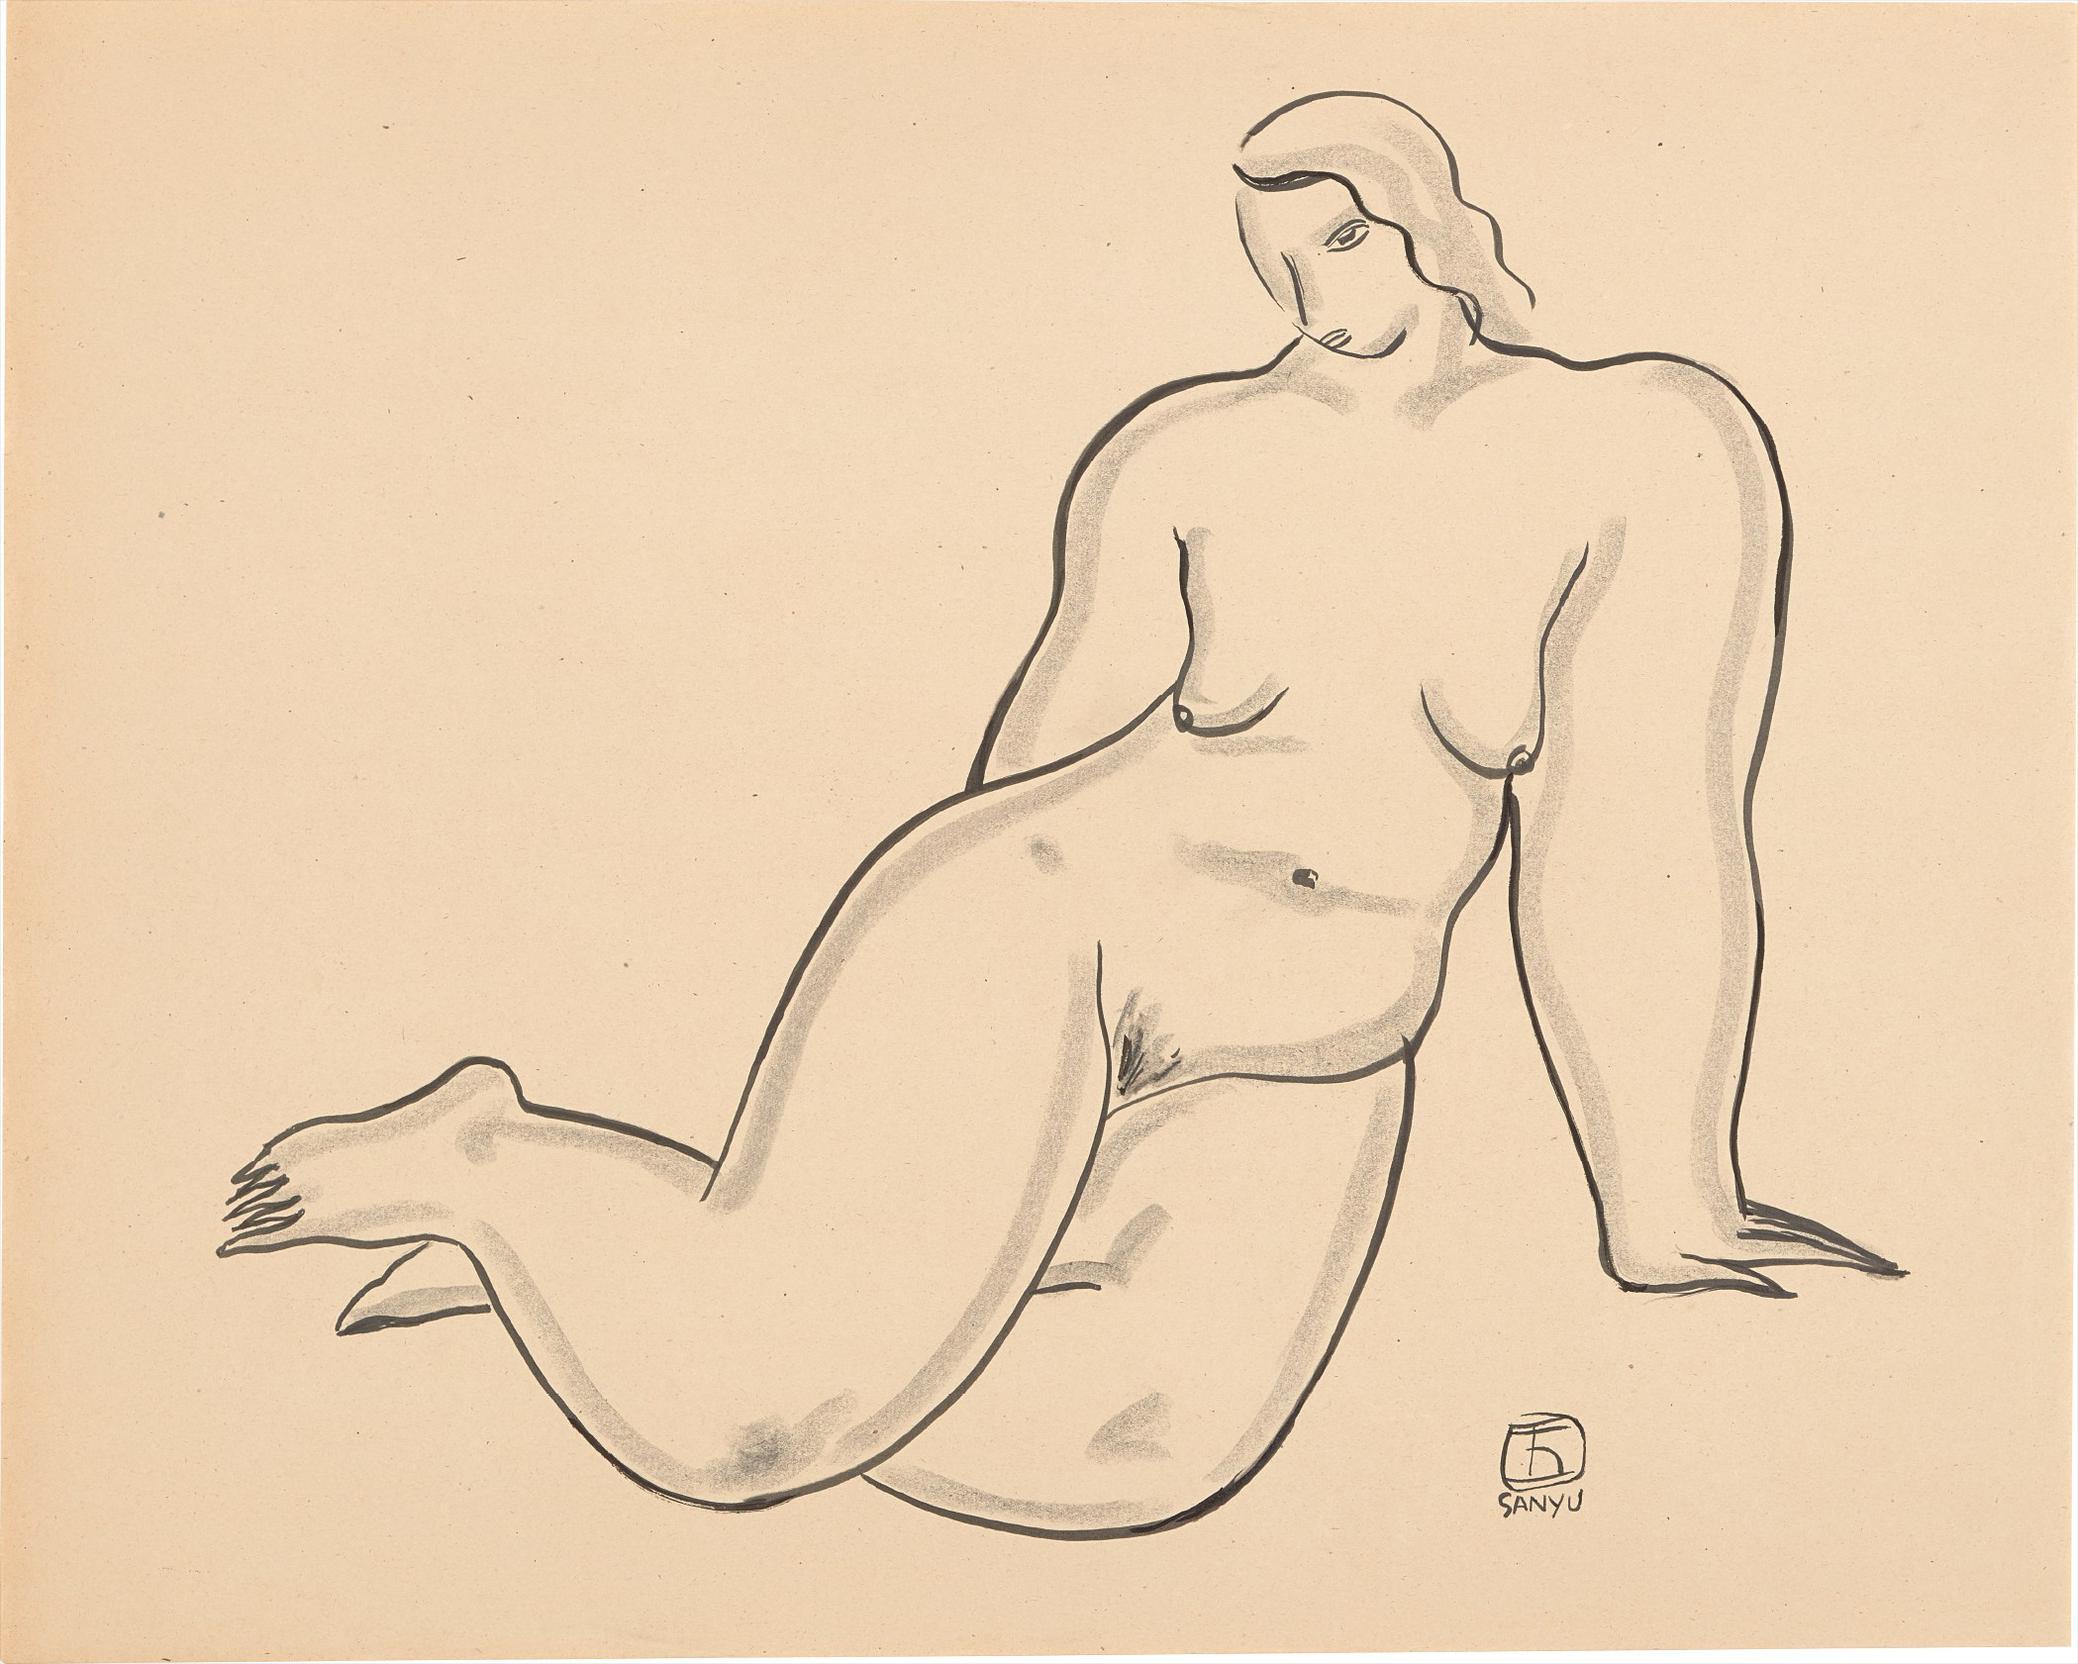 Sanyu-Nude-